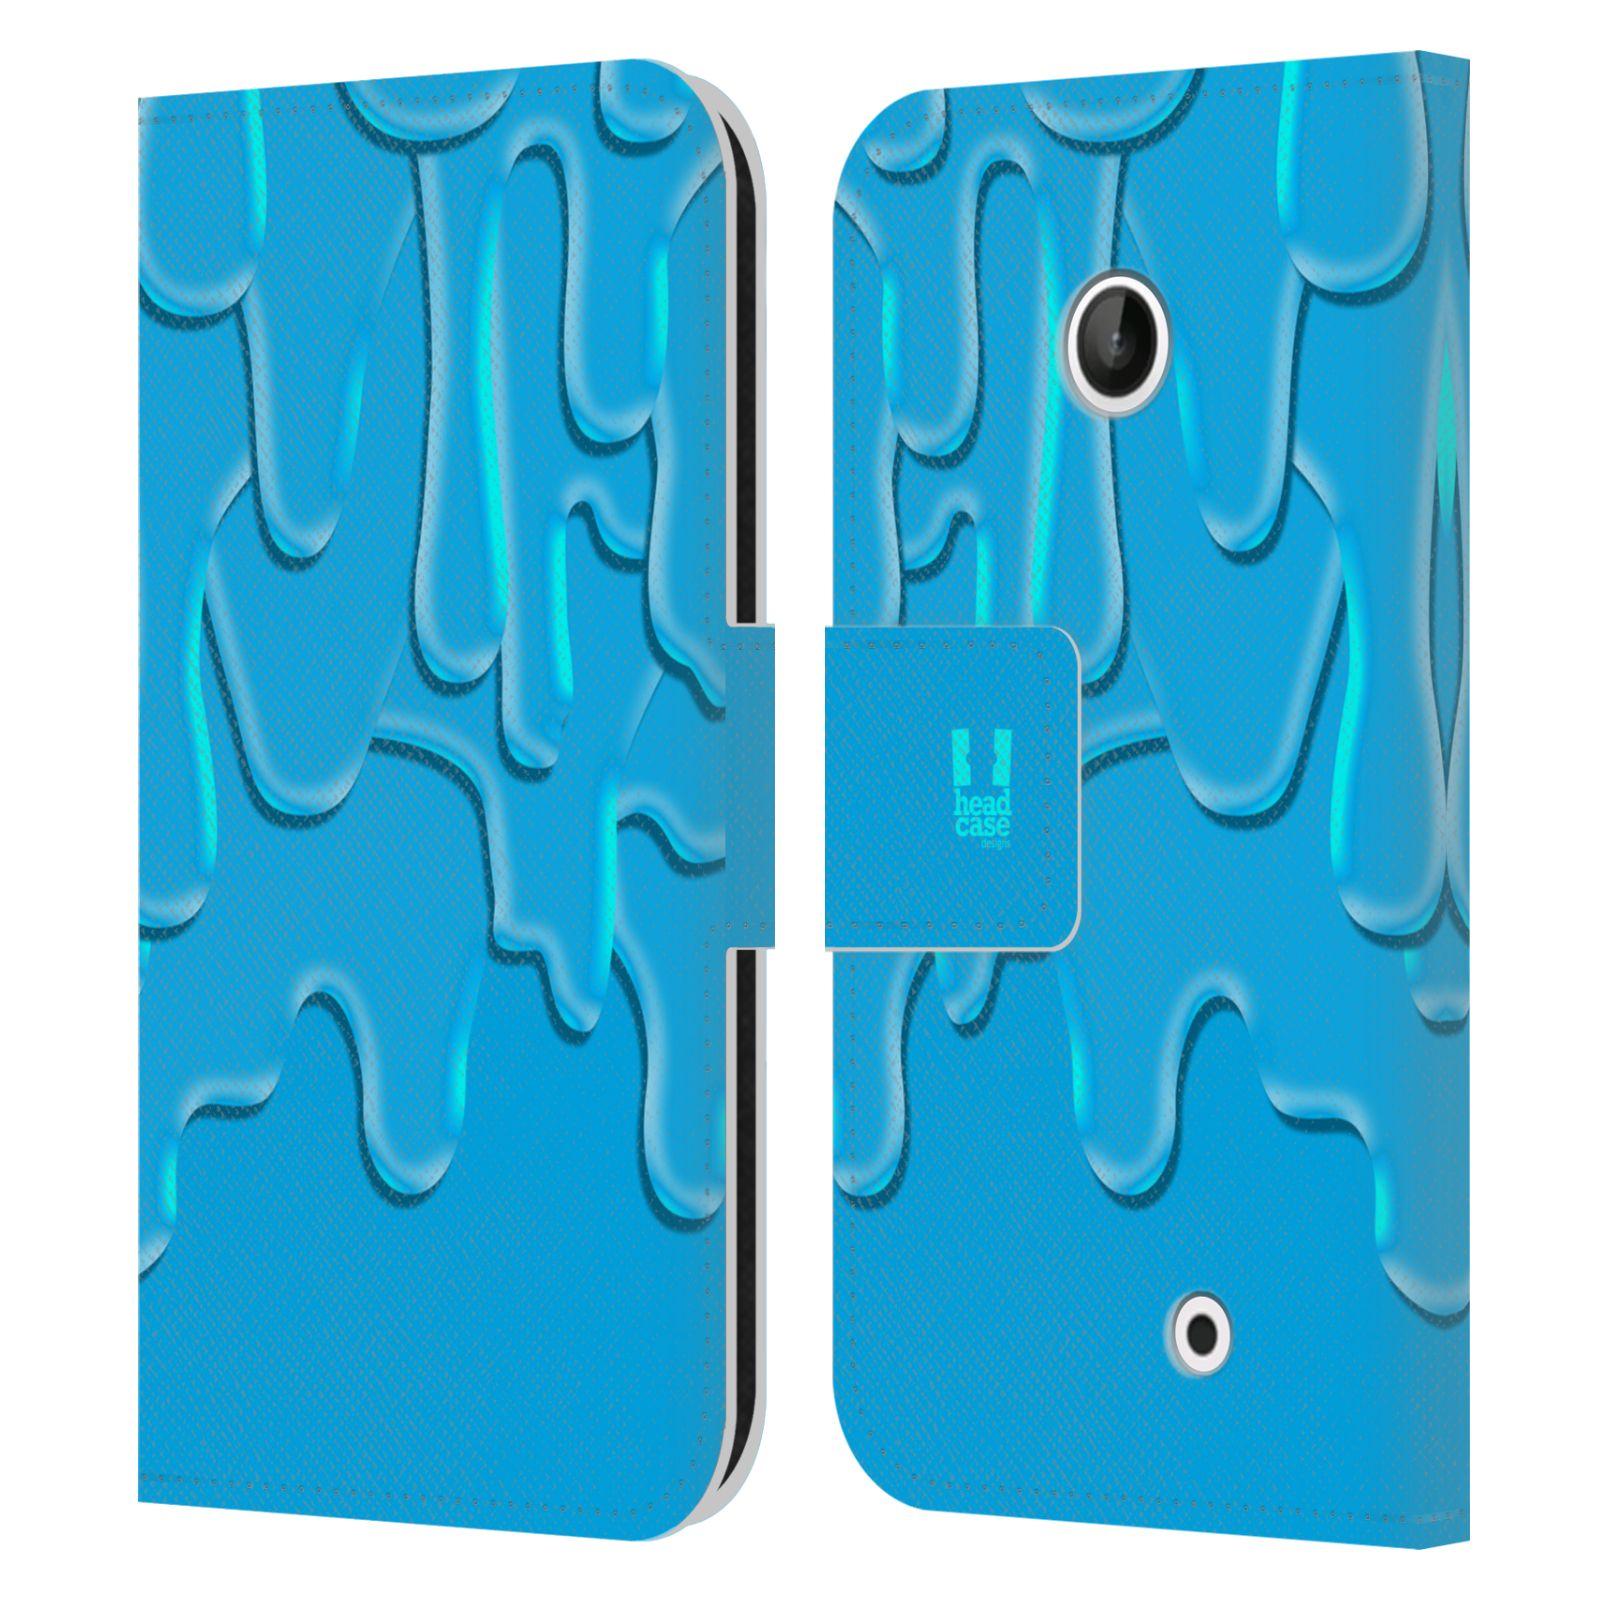 HEAD CASE Flipové pouzdro pro mobil NOKIA LUMIA 630 / LUMIA 630 DUAL ZÁPLAVA BARVA tyrkysová modrá